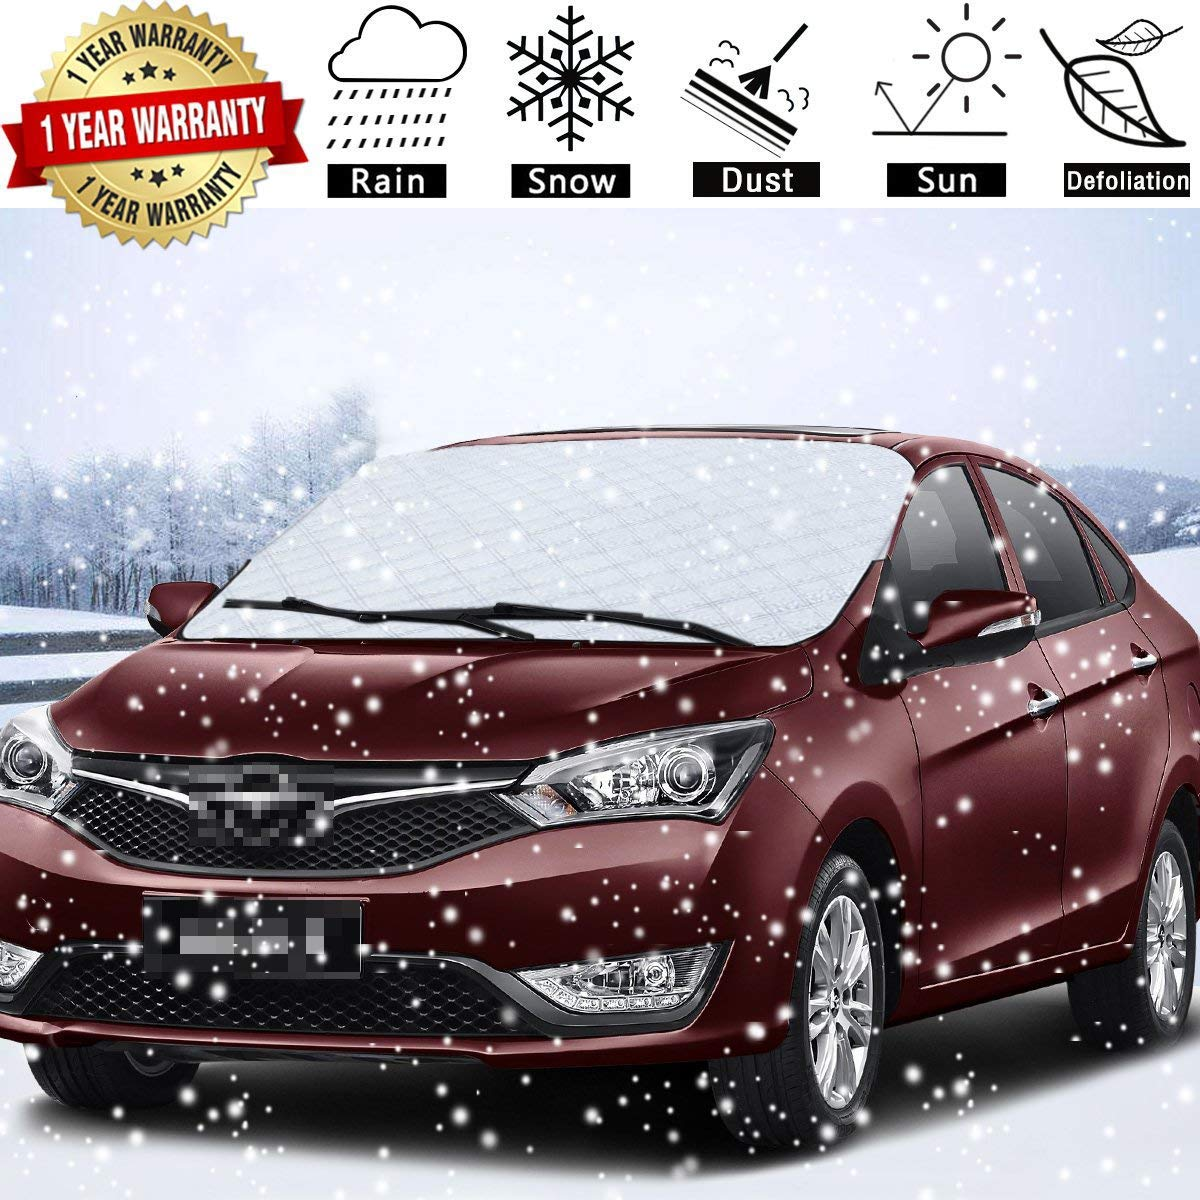 SuBleer Silver Car Windshield Cover Ice Snow Sun Shade UV Protection Sunshade Sunlight Blocker Waterproof/Windproof/Dustproof/Scratch (KM-L08R-Y9PS)